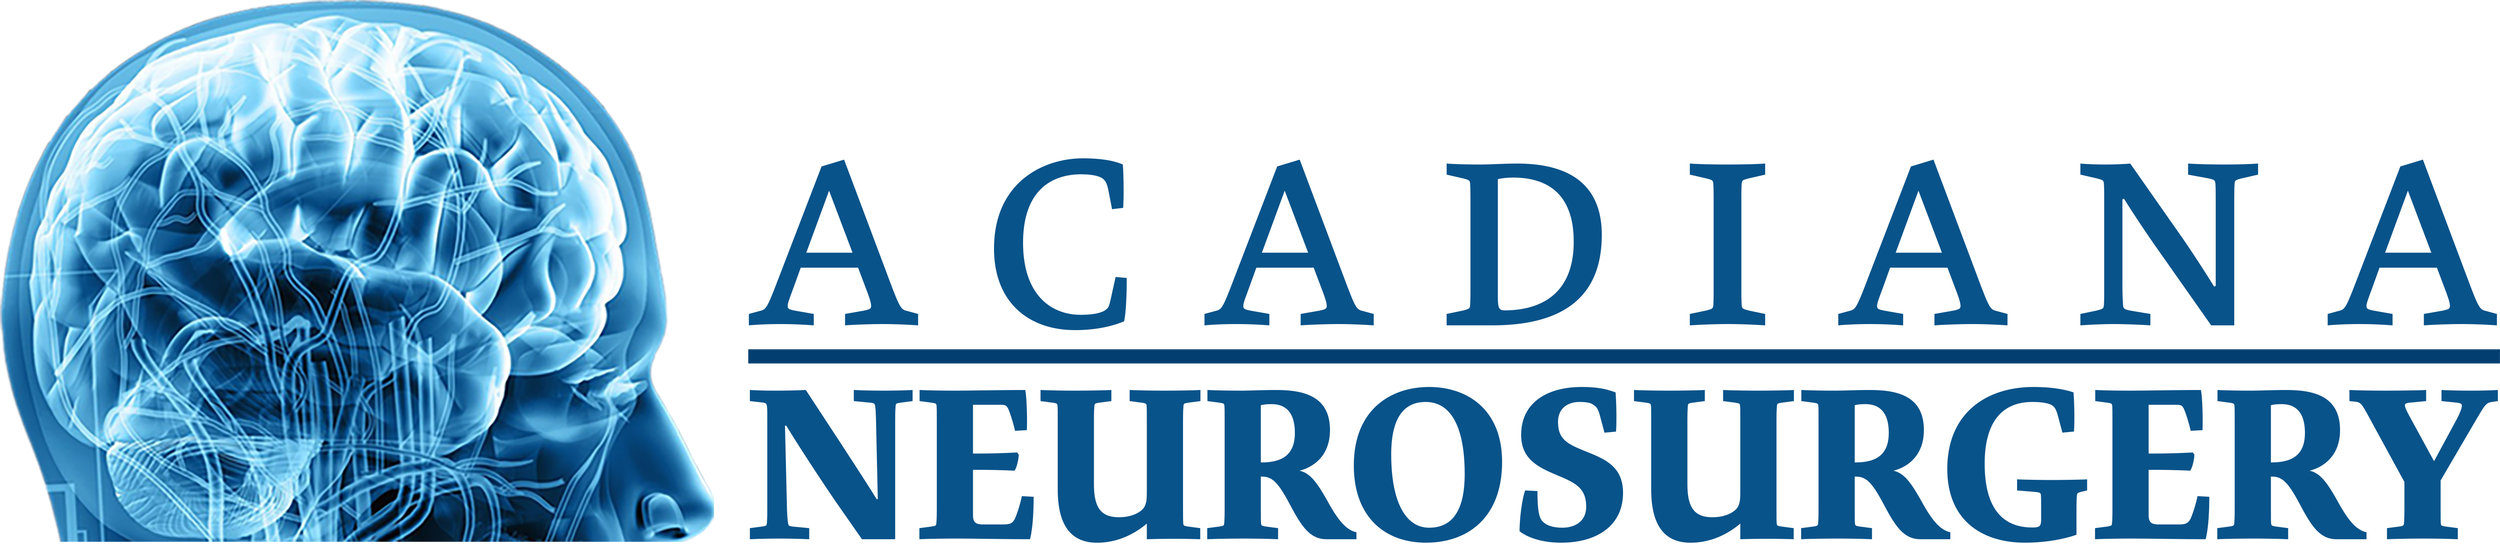 Acadiana Neurosurgery Logo 2018.jpg